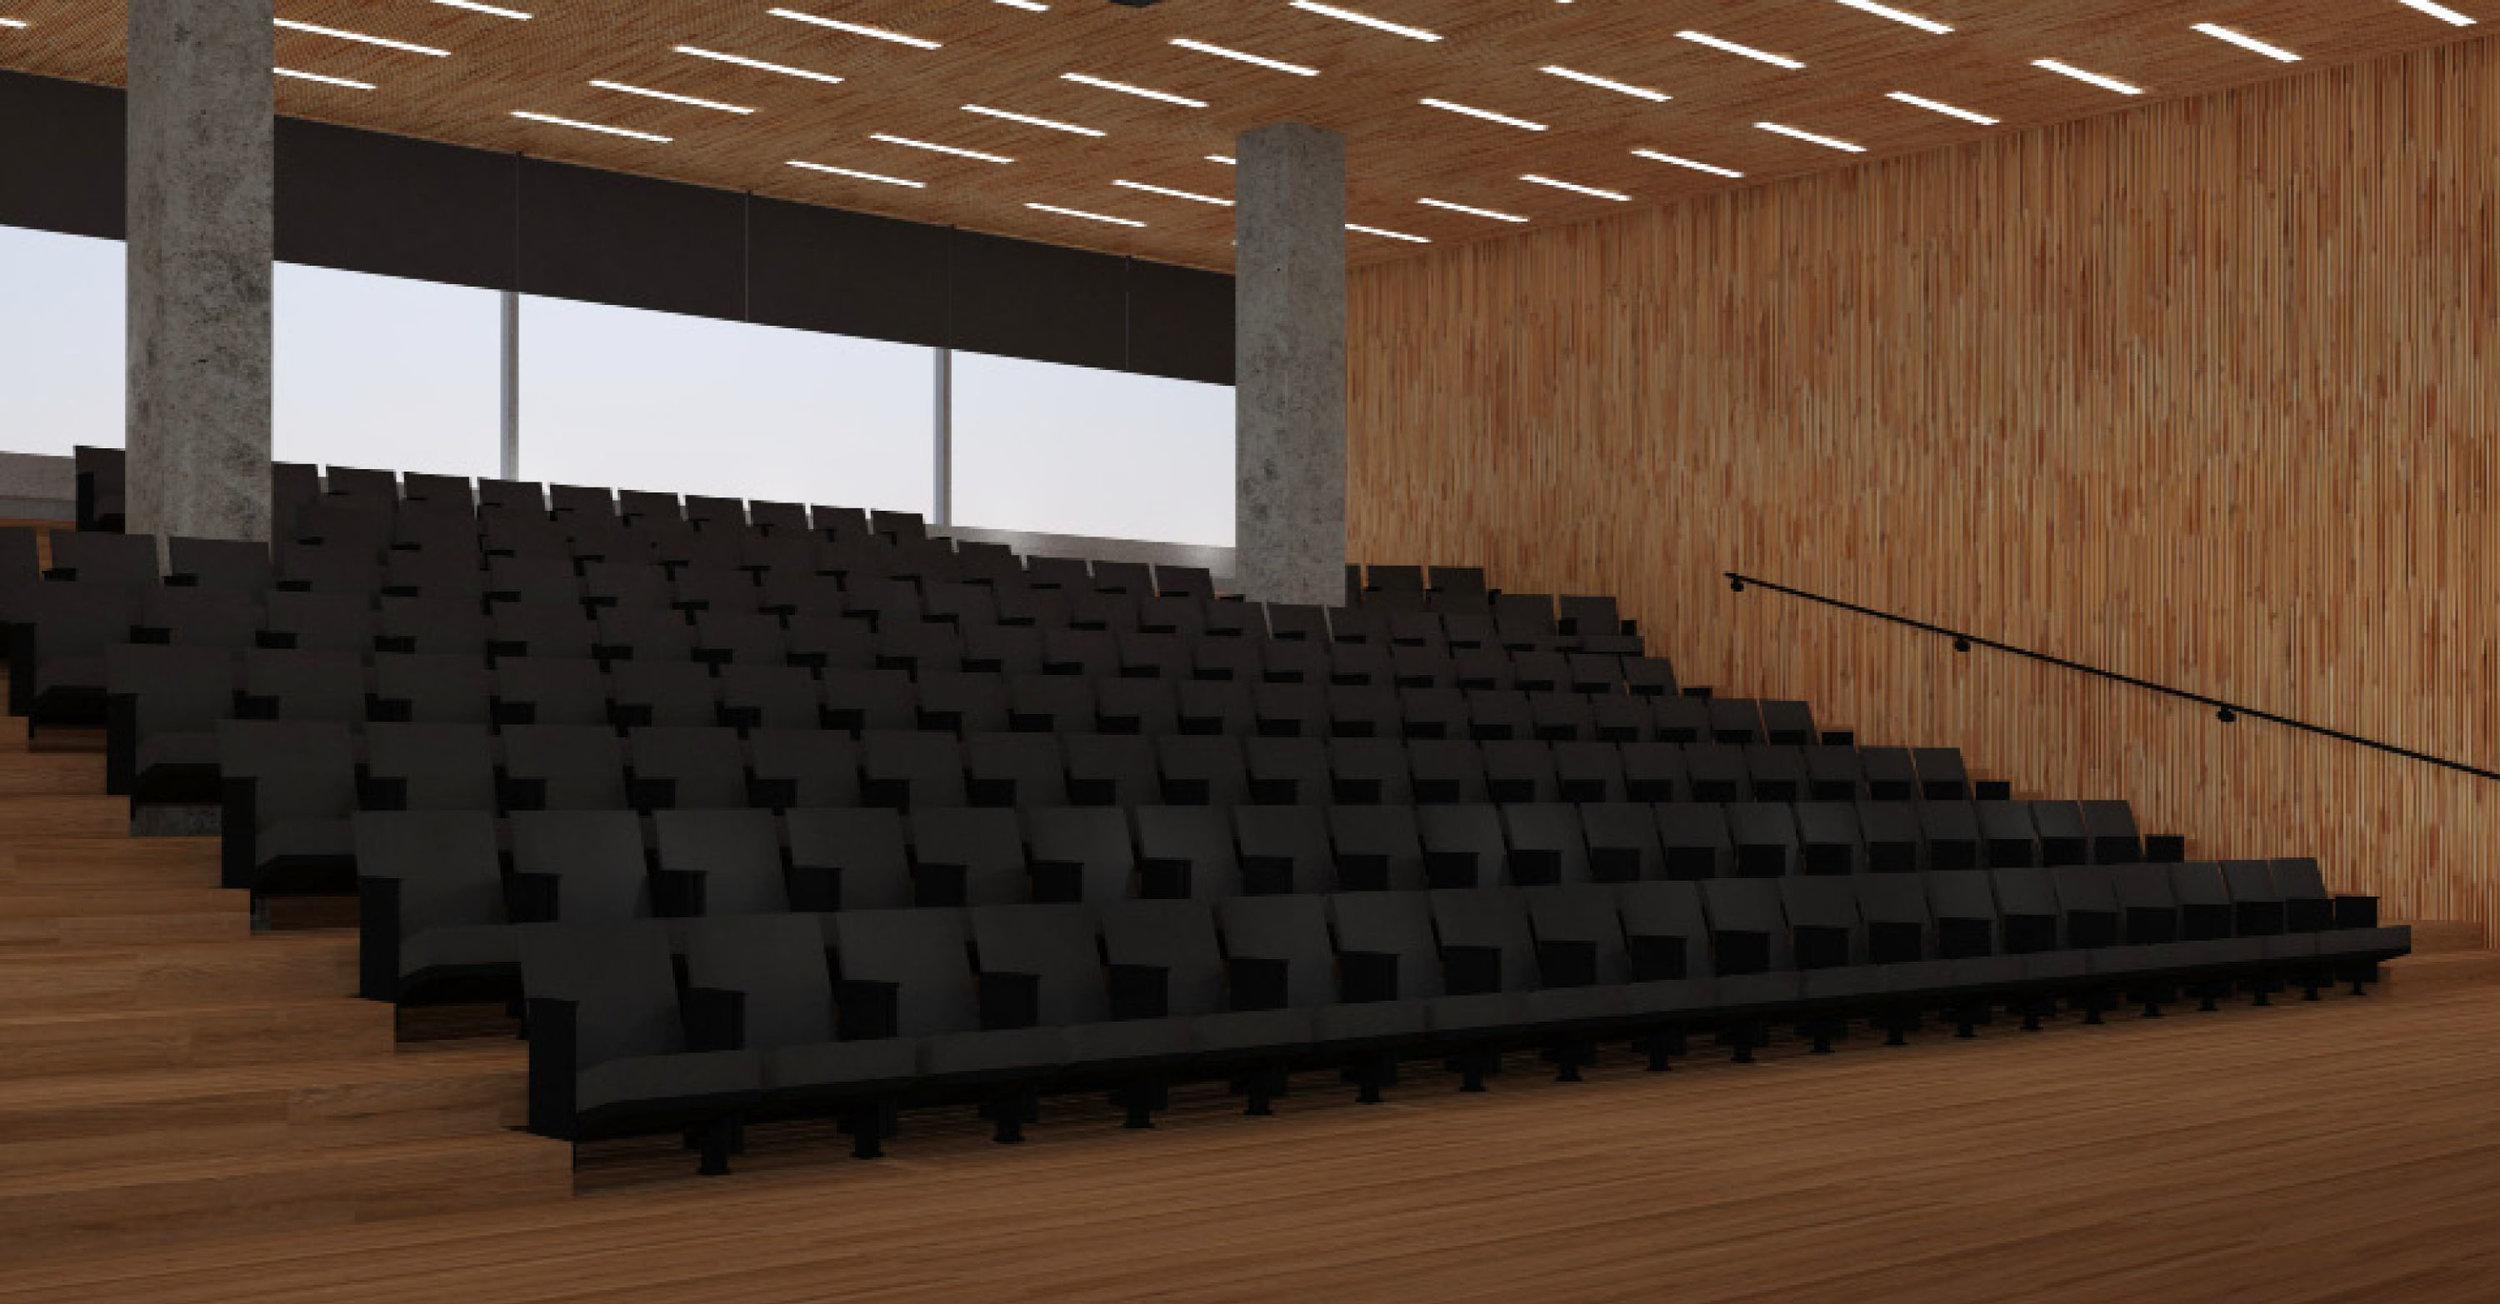 carly-thompson-new-york-school-of-interior-design-bfa_17862935345_o.jpg